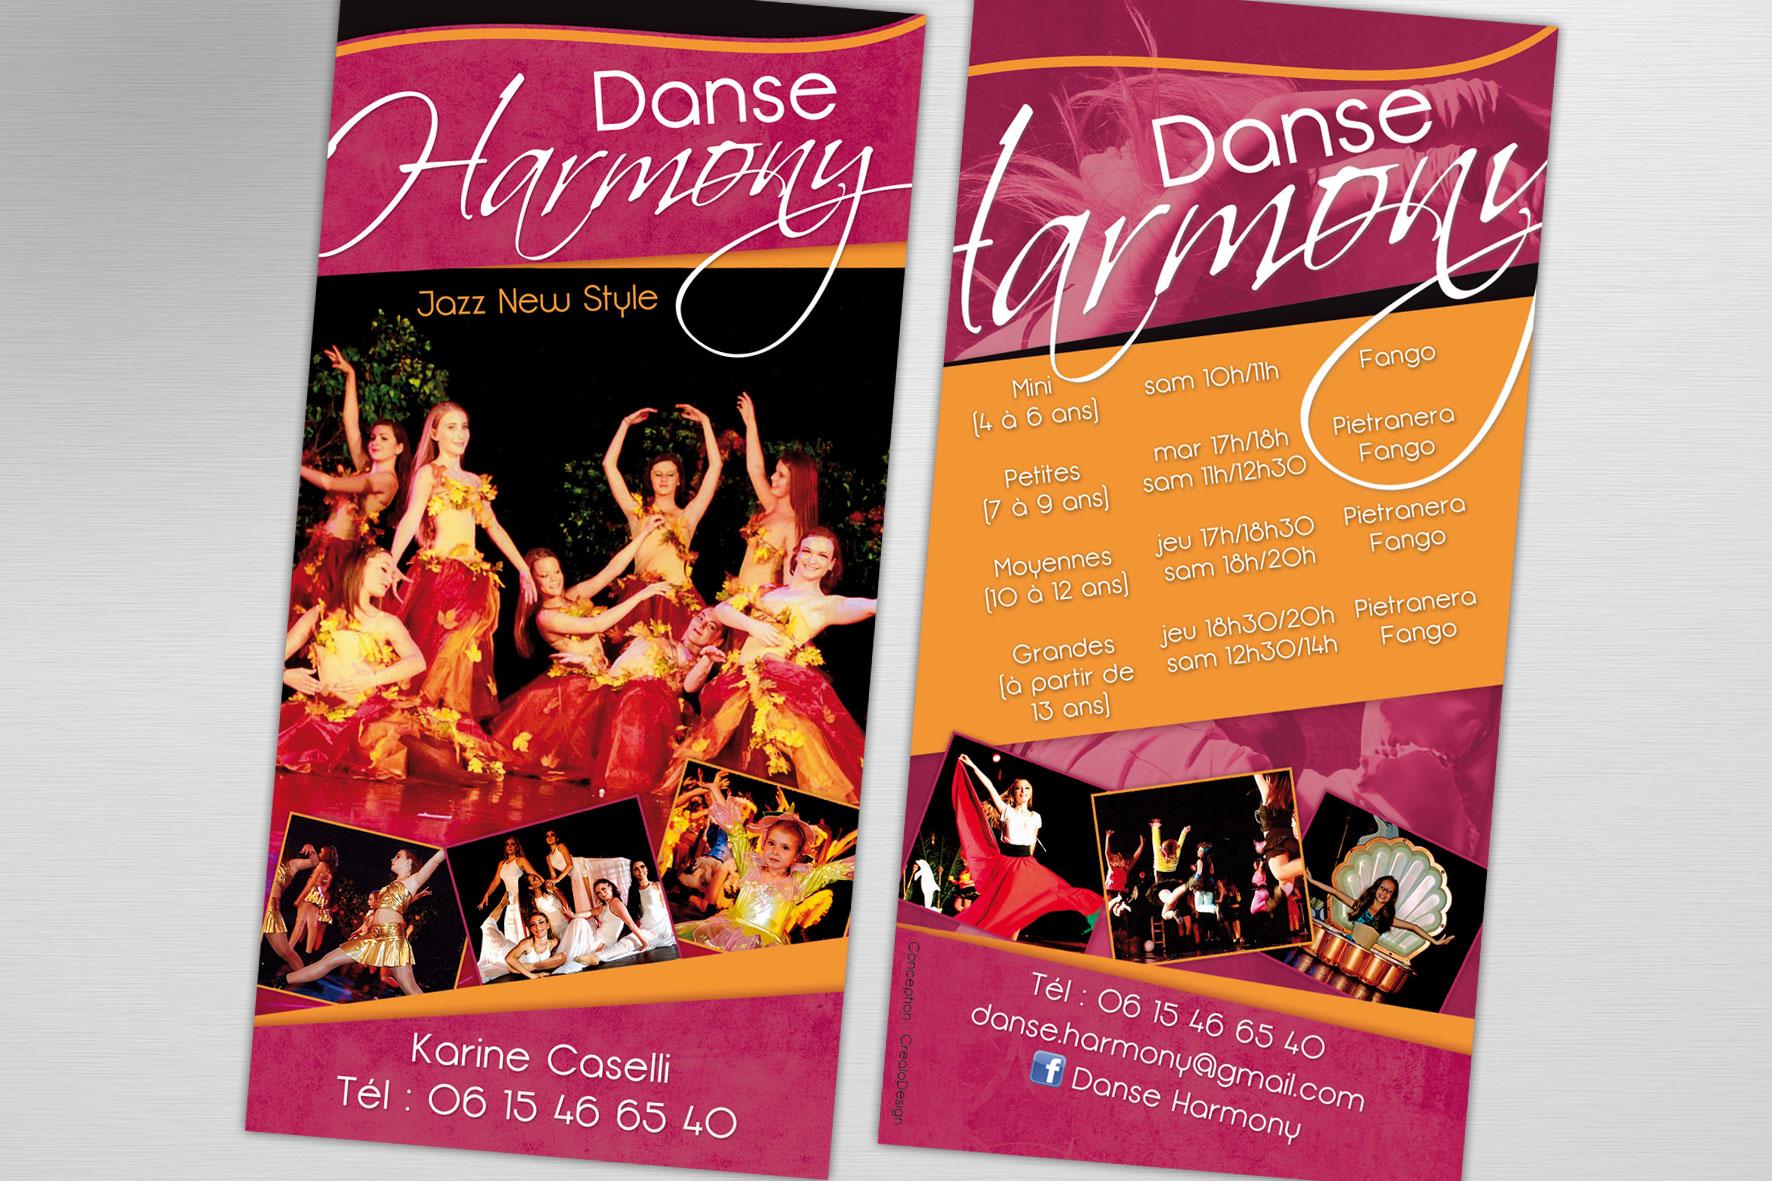 Danse Harmony